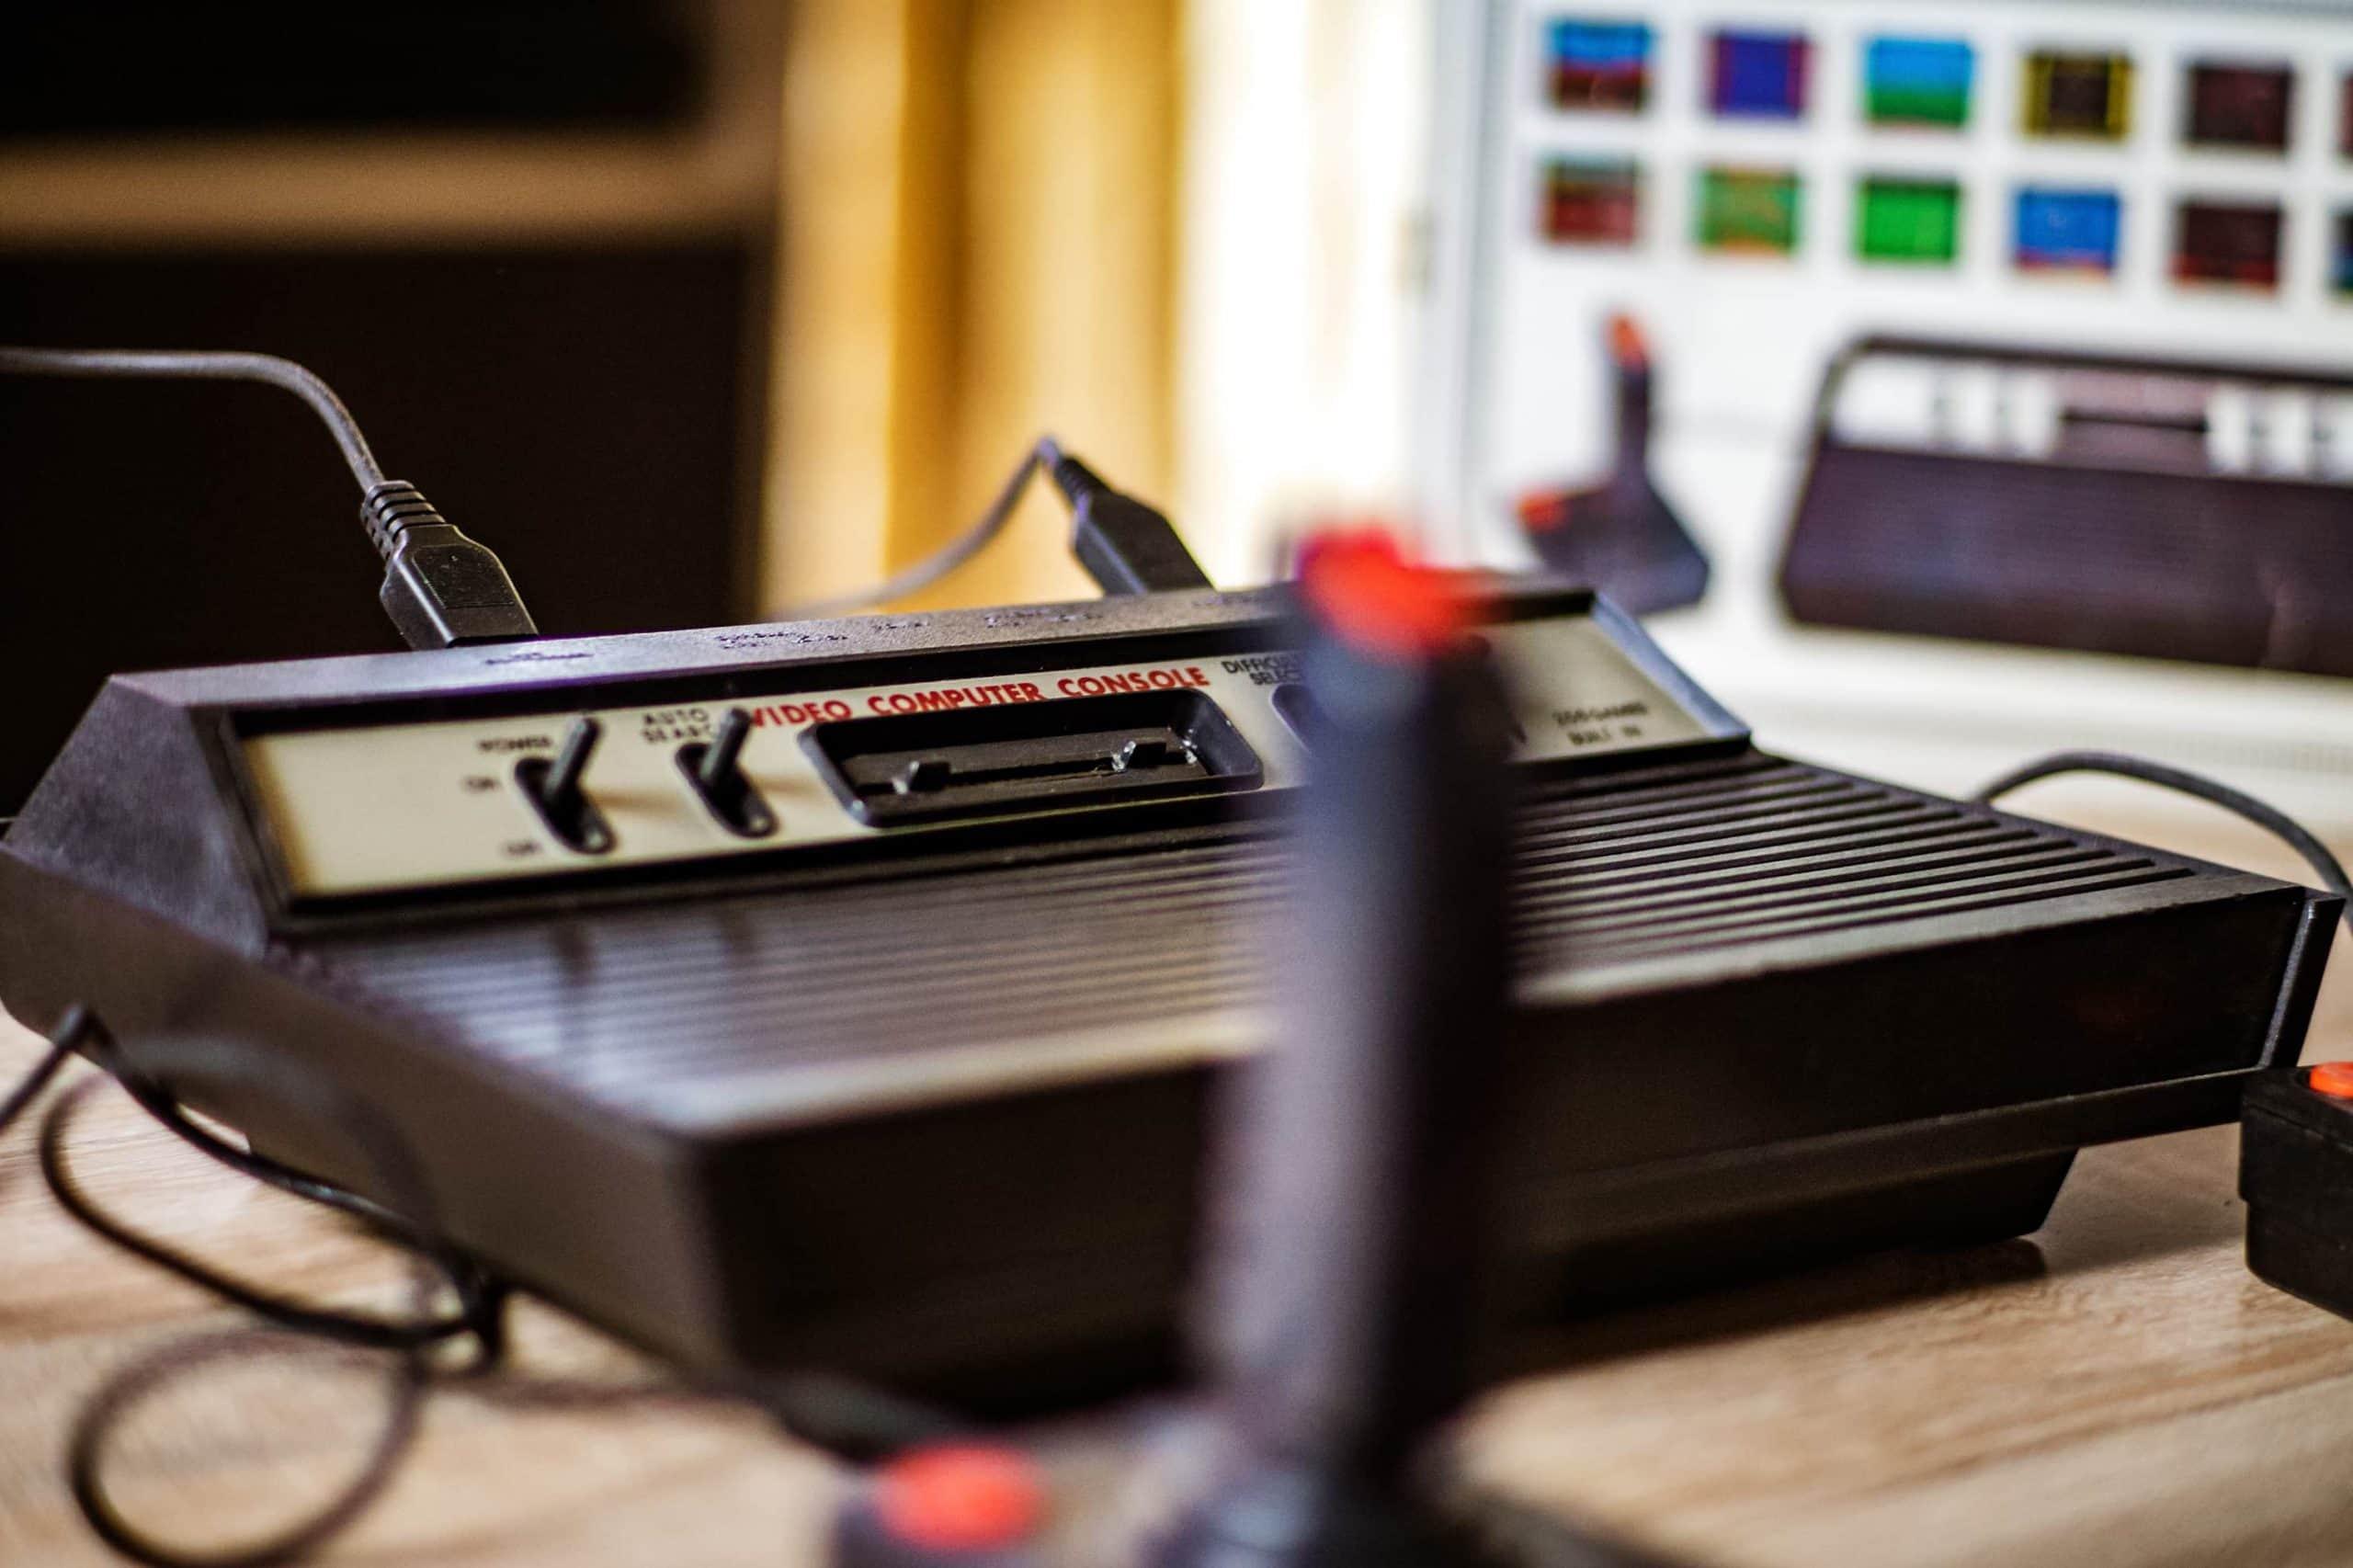 Atari-Konsole